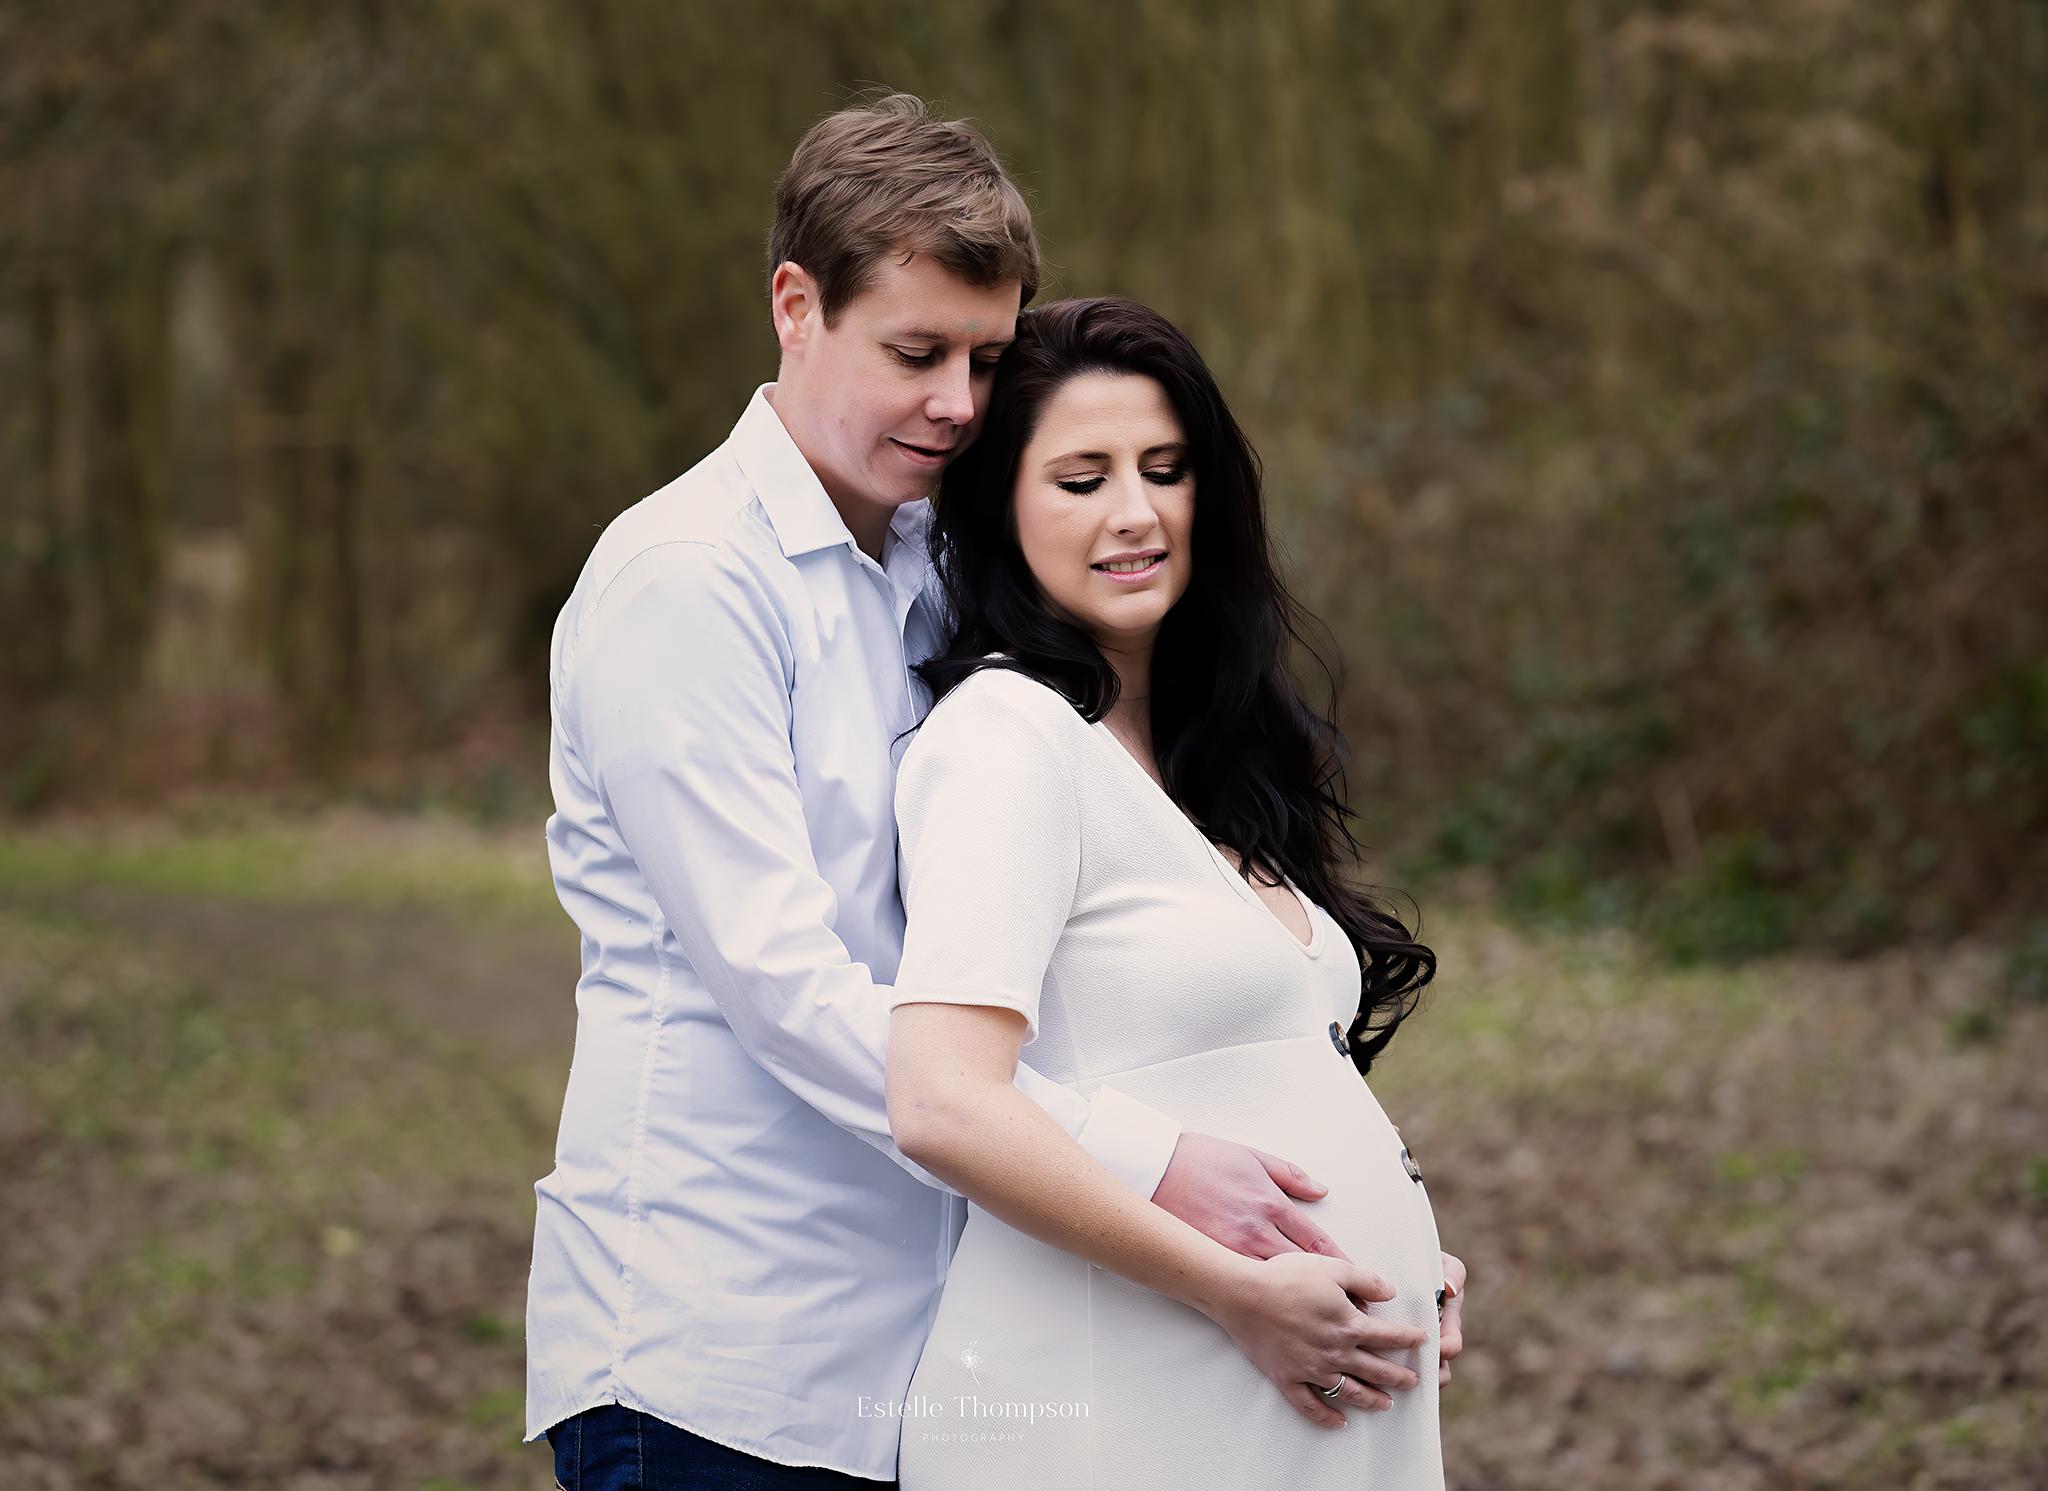 Family photoshoot in sevenoaks